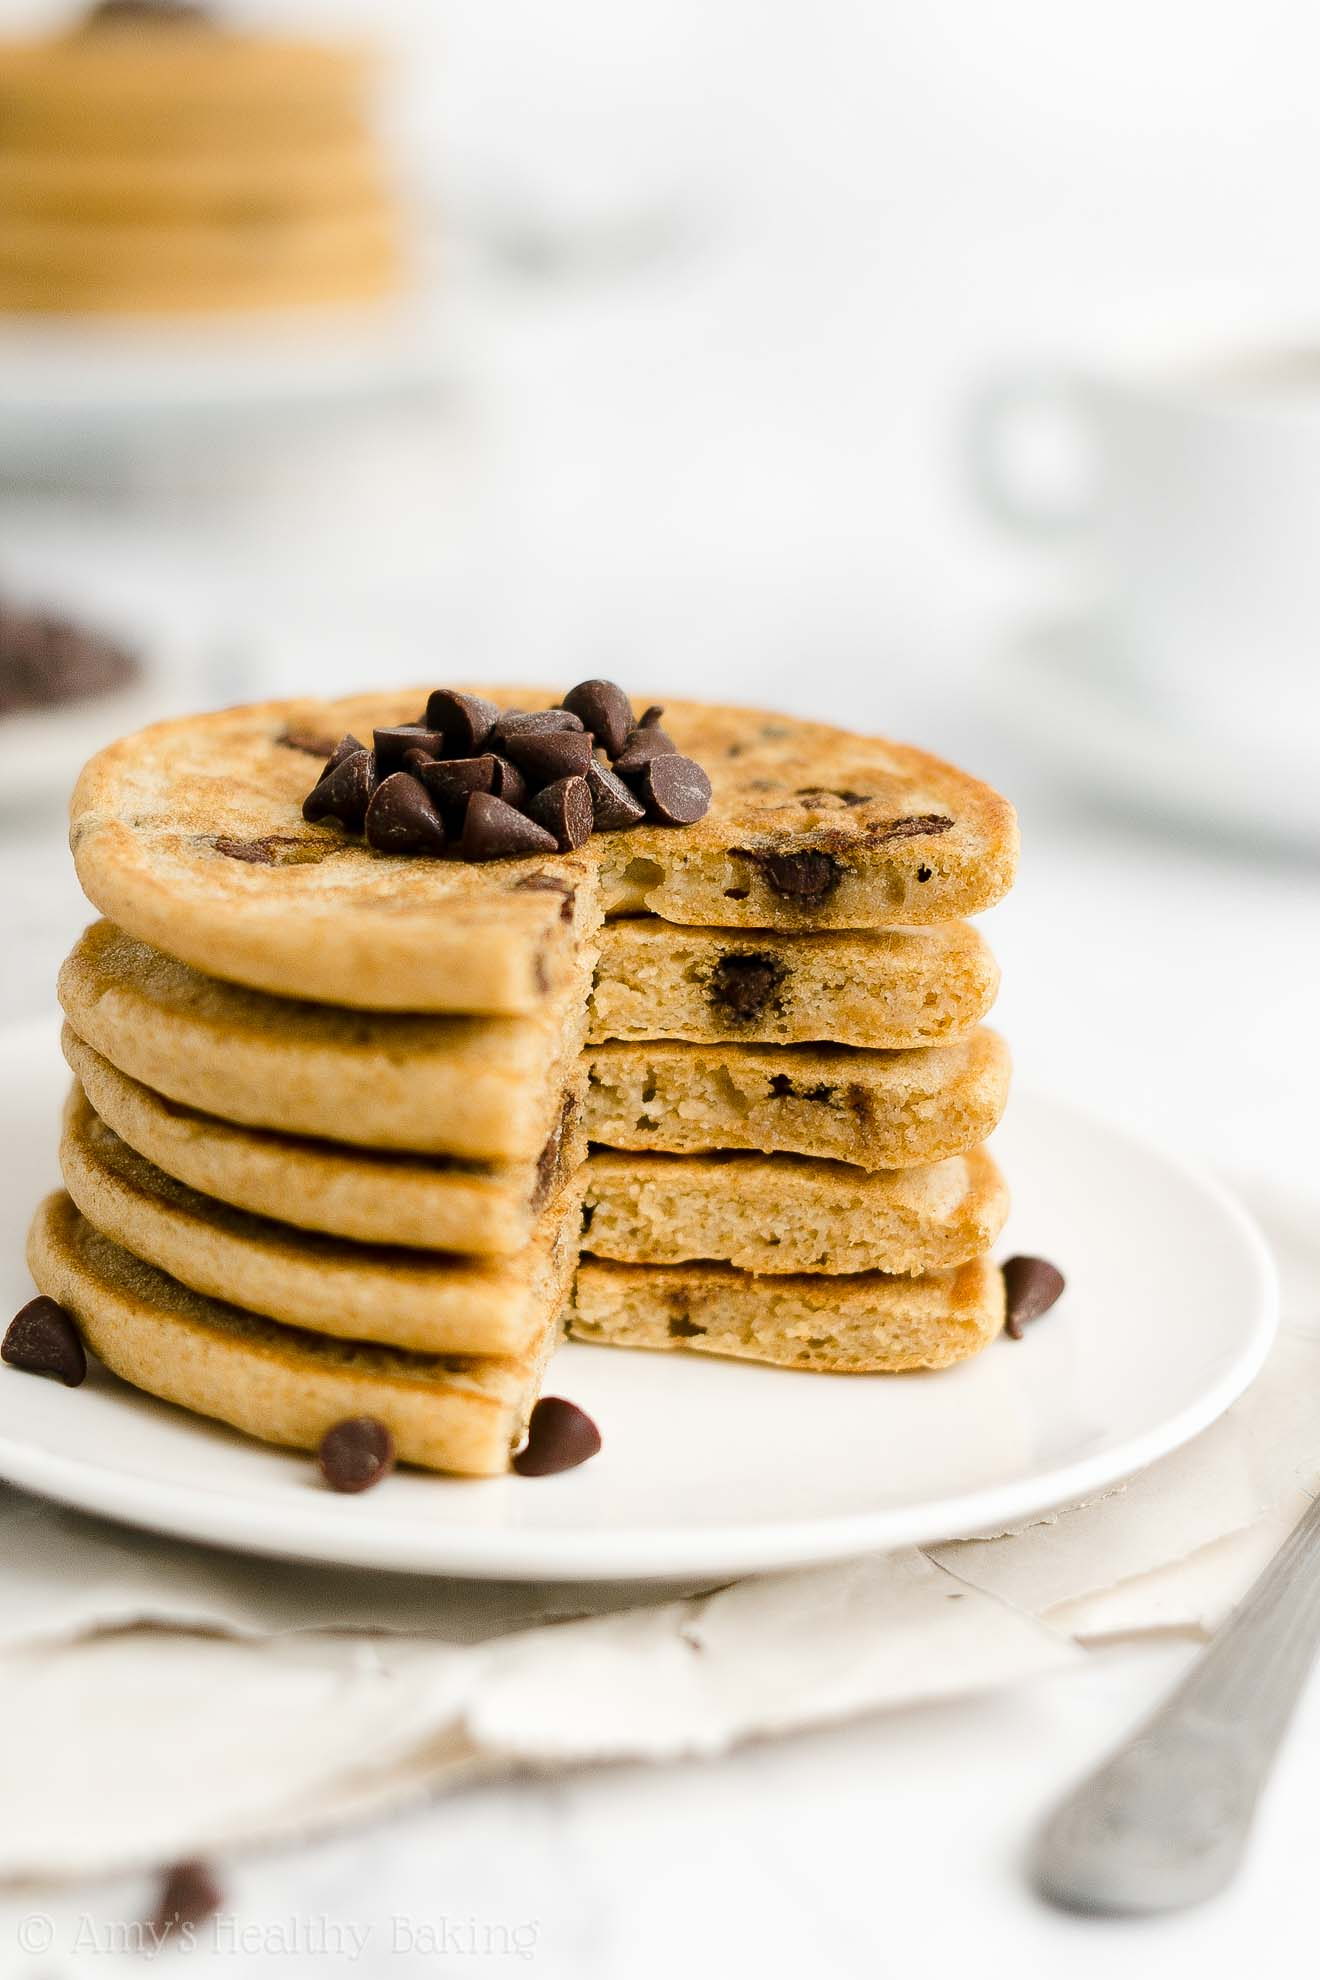 ULTIMATE Best Easy Healthy Low Fat Sugar Free Vegan Chocolate Chip Pancakes